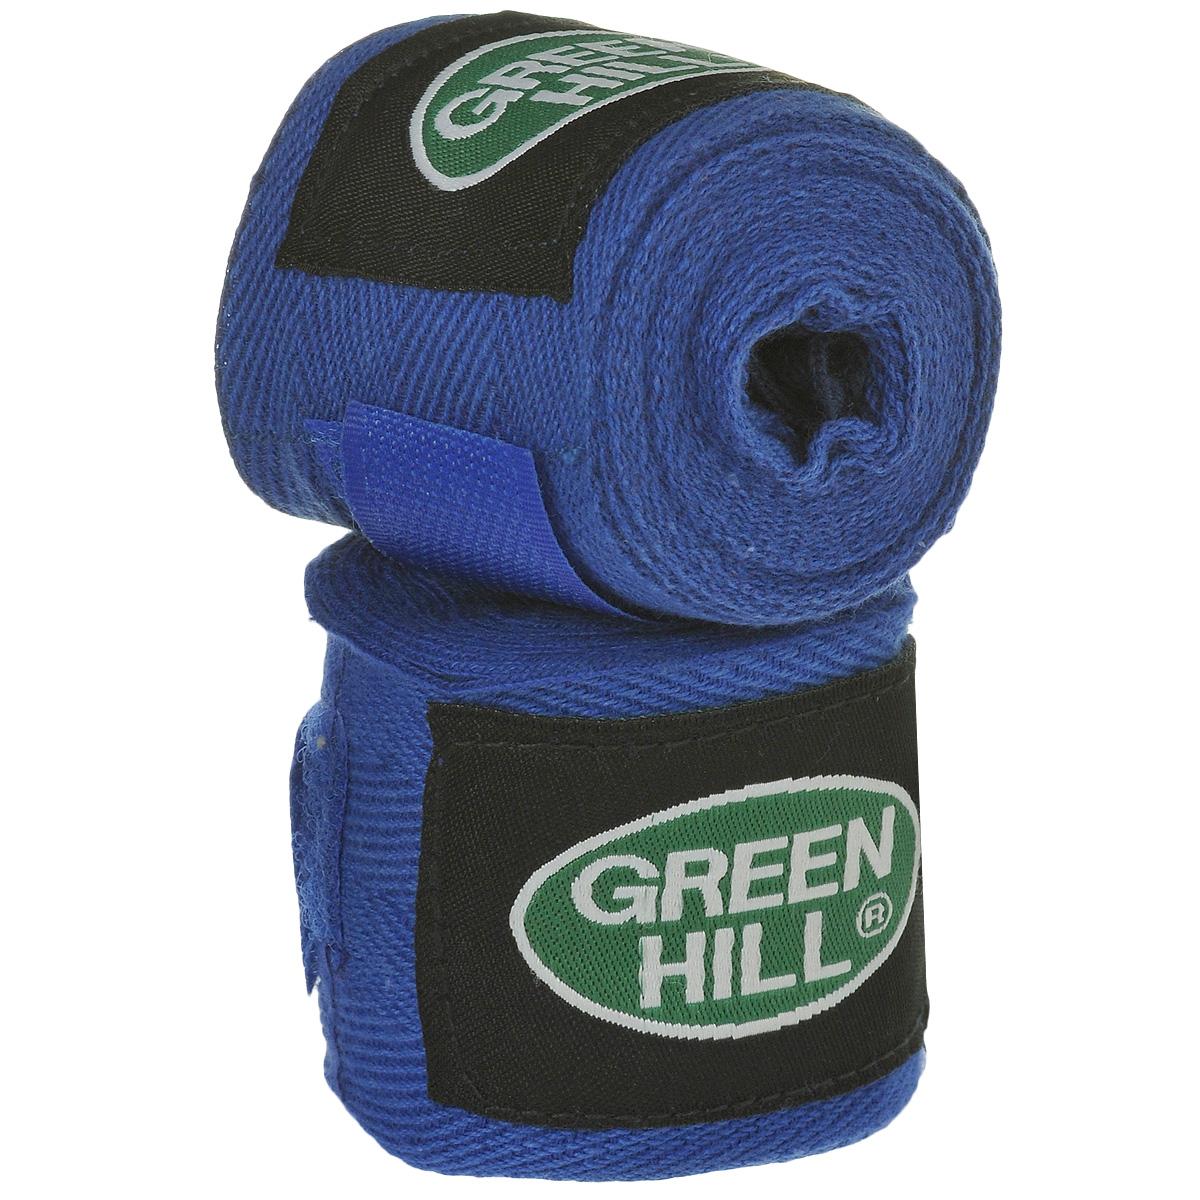 "Green Hill Бинты боксерские ""Green Hill"", хлопок, цвет: синий, 2,5 м, 2 шт"